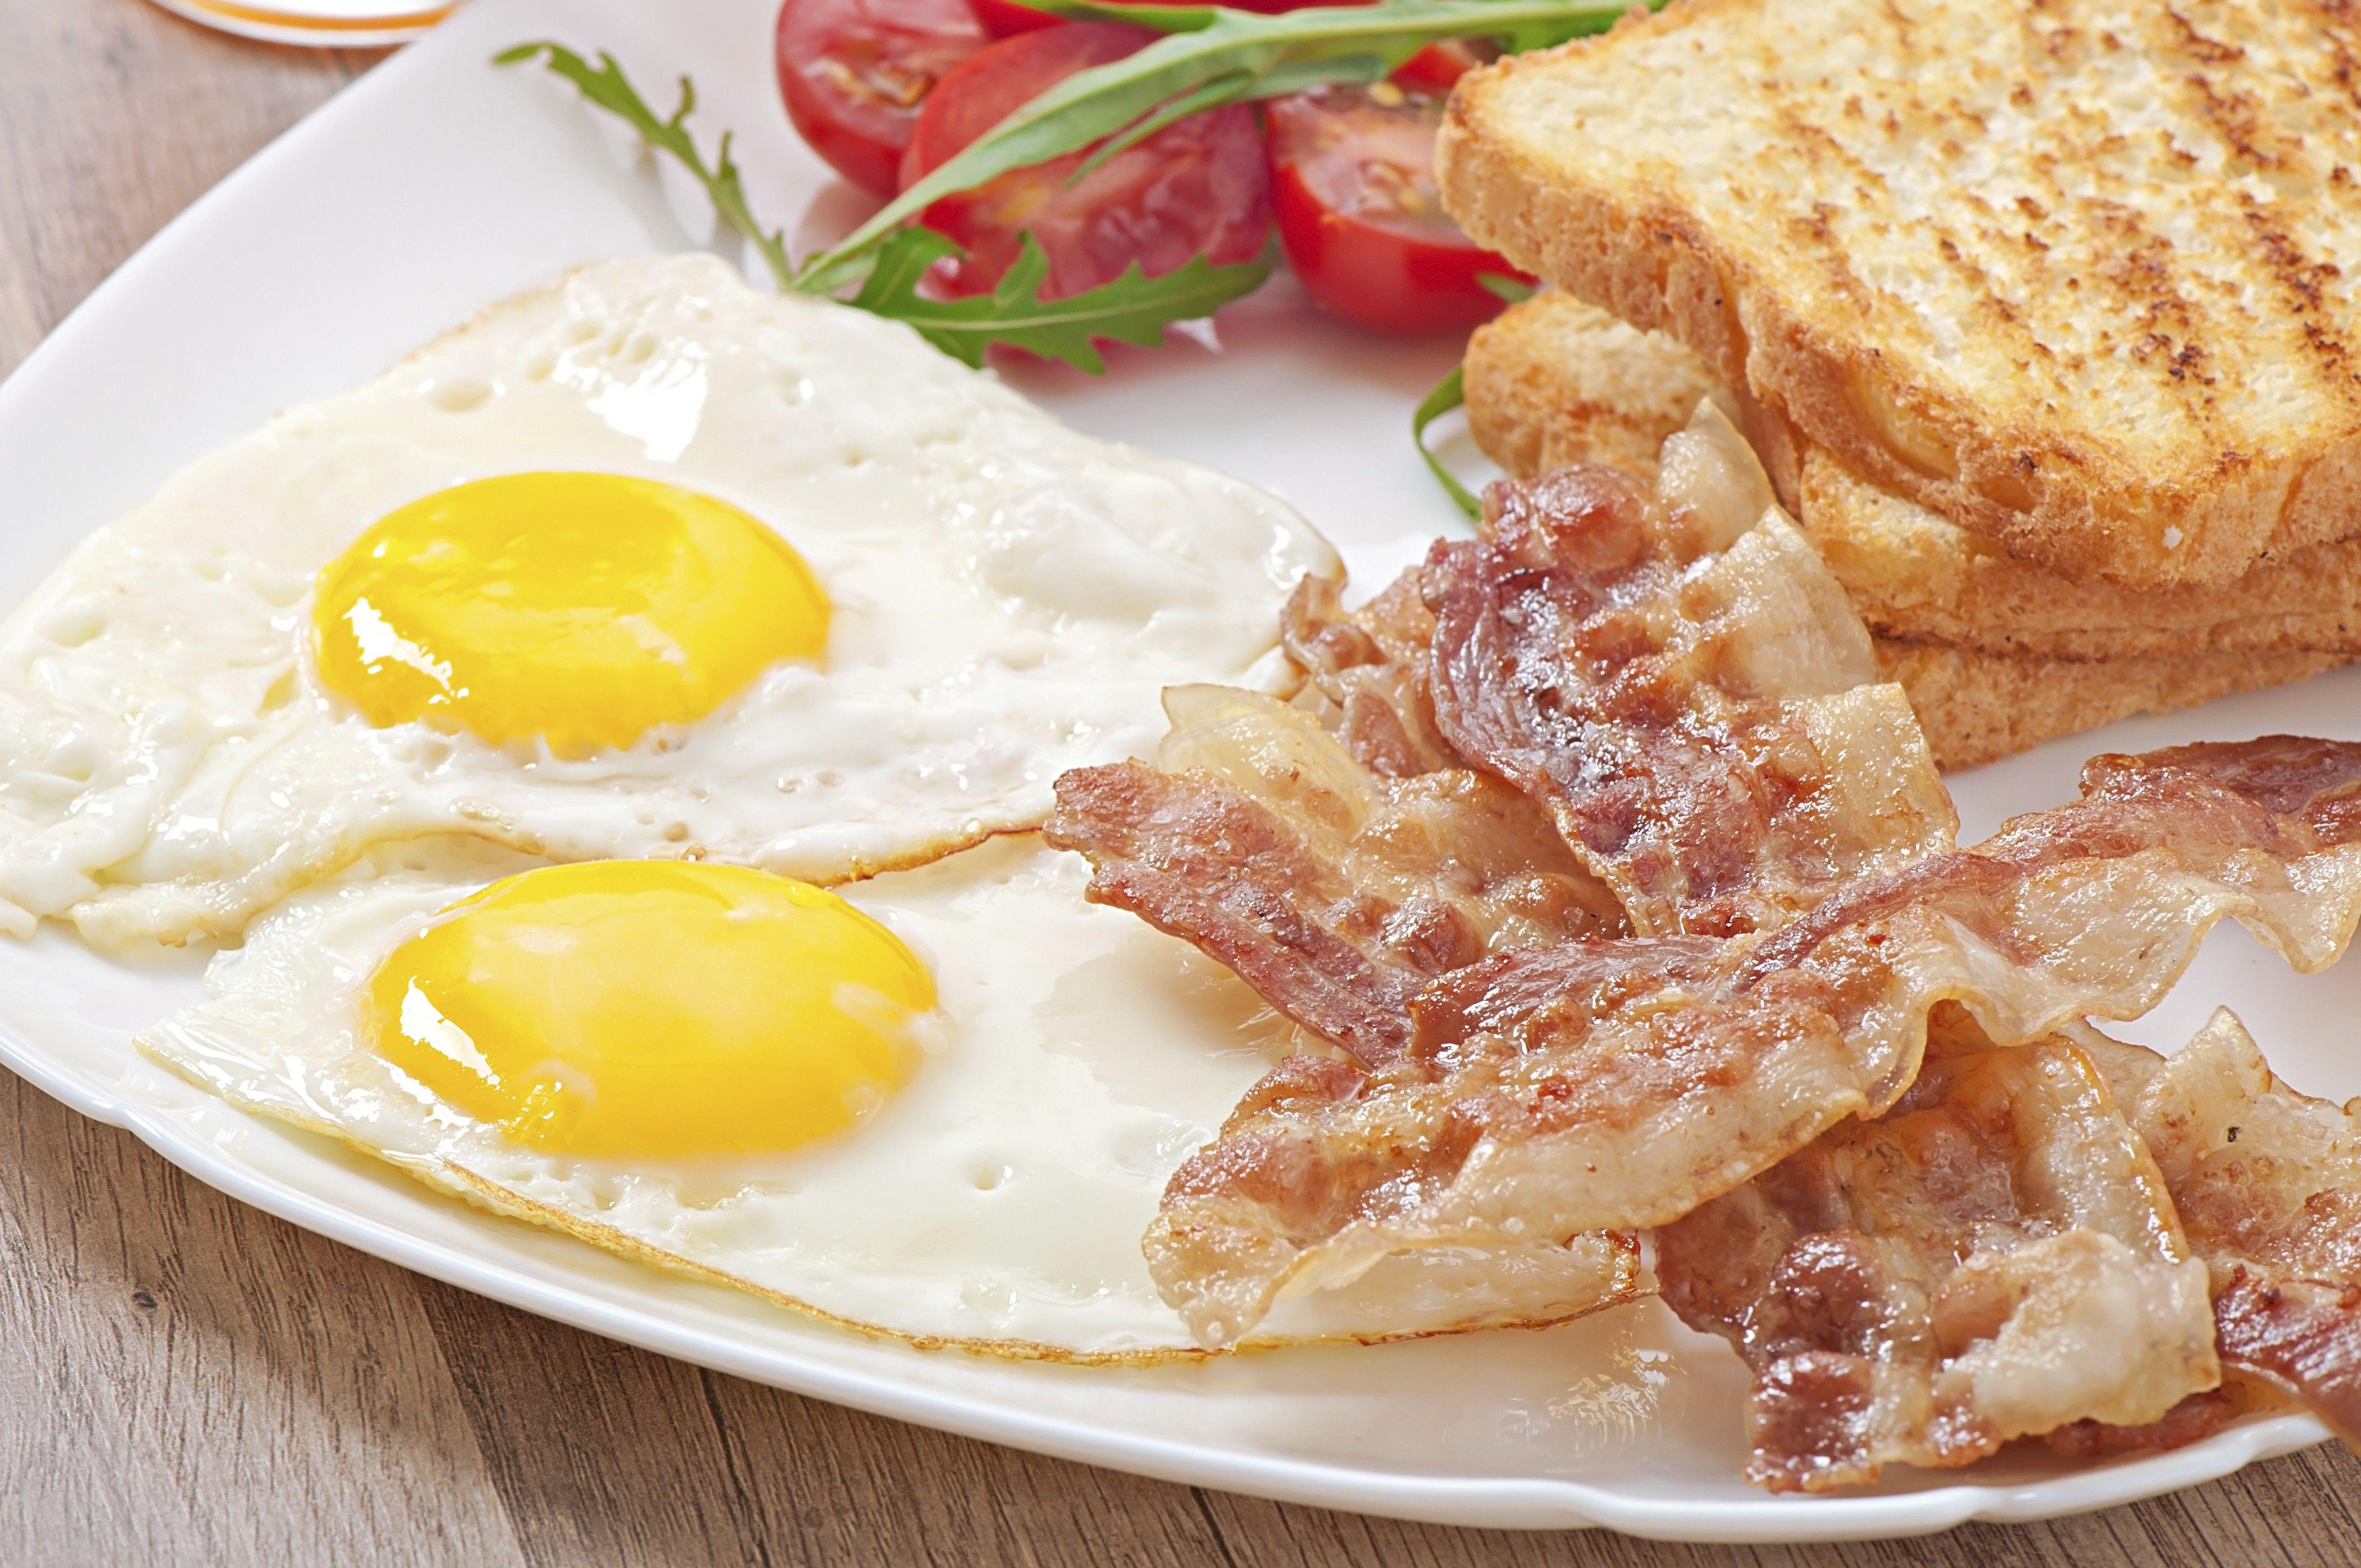 Super Ricette sfiziose per una colazione salata HQ46